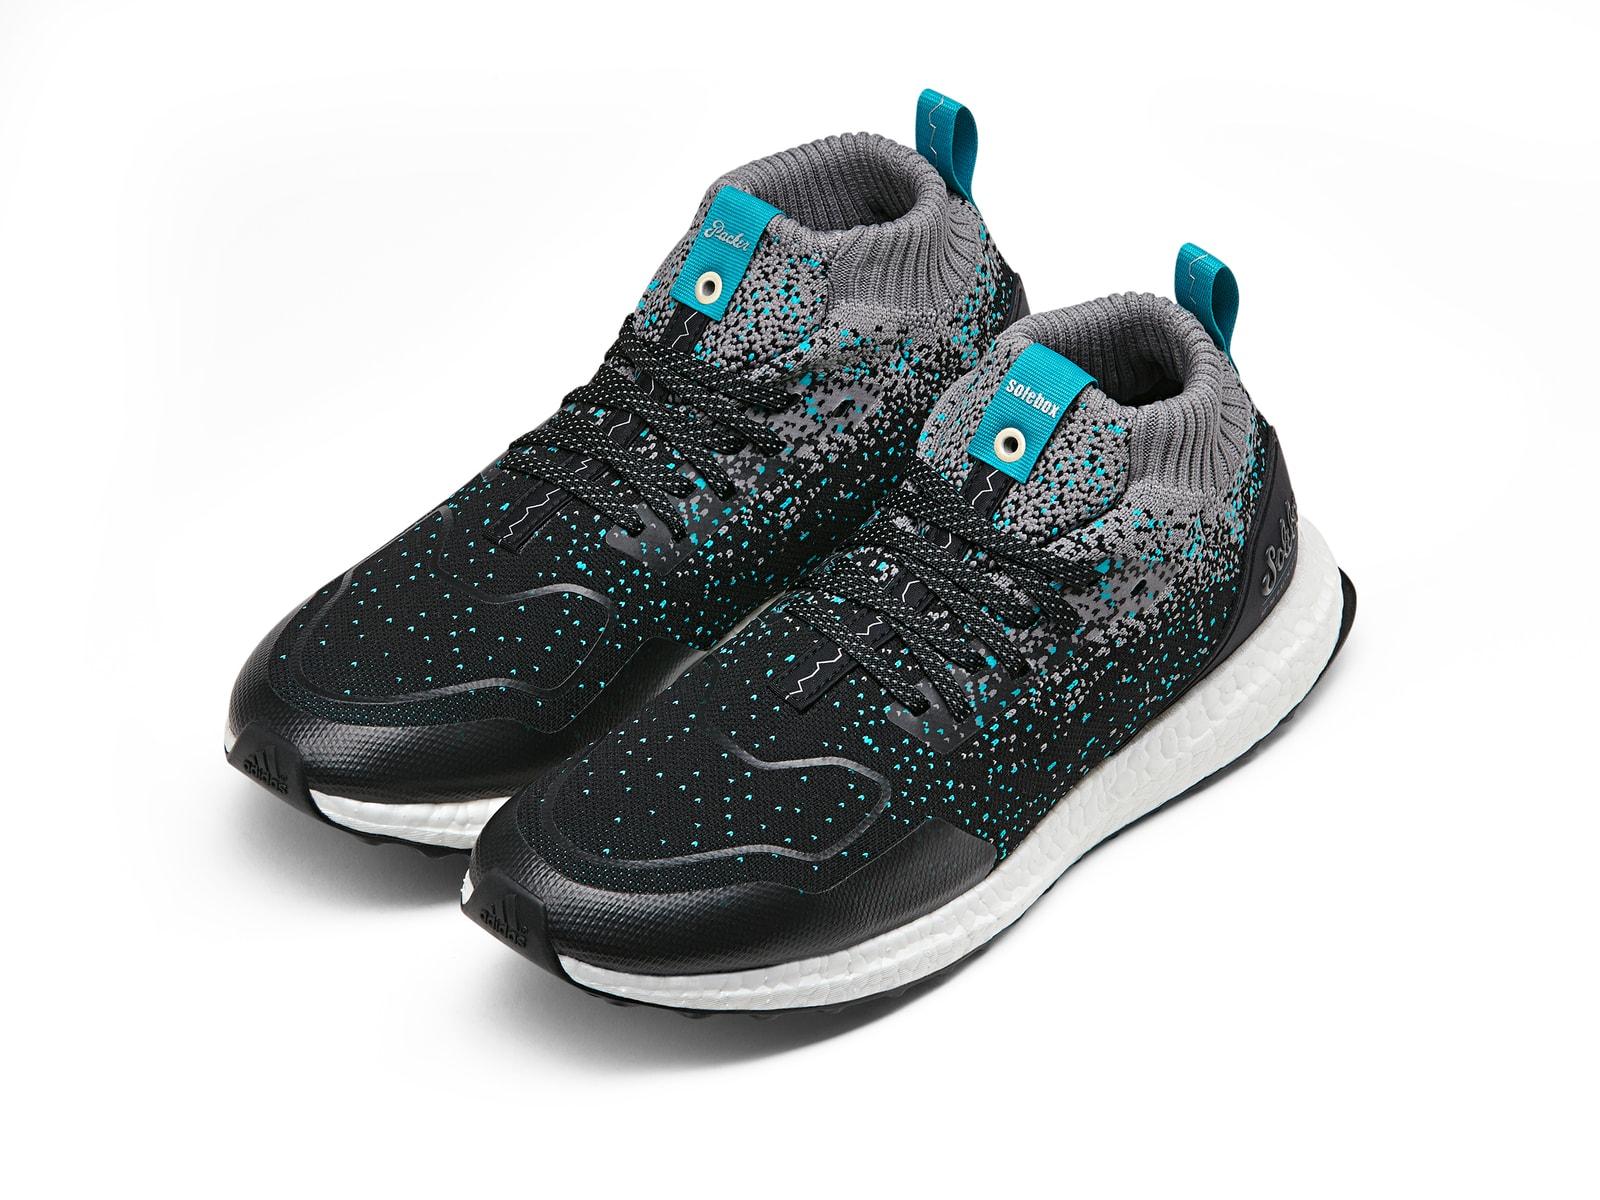 adidas Consortium x Packer x Solebox 三方聯乘「Sneaker Echange」企劃正式發佈